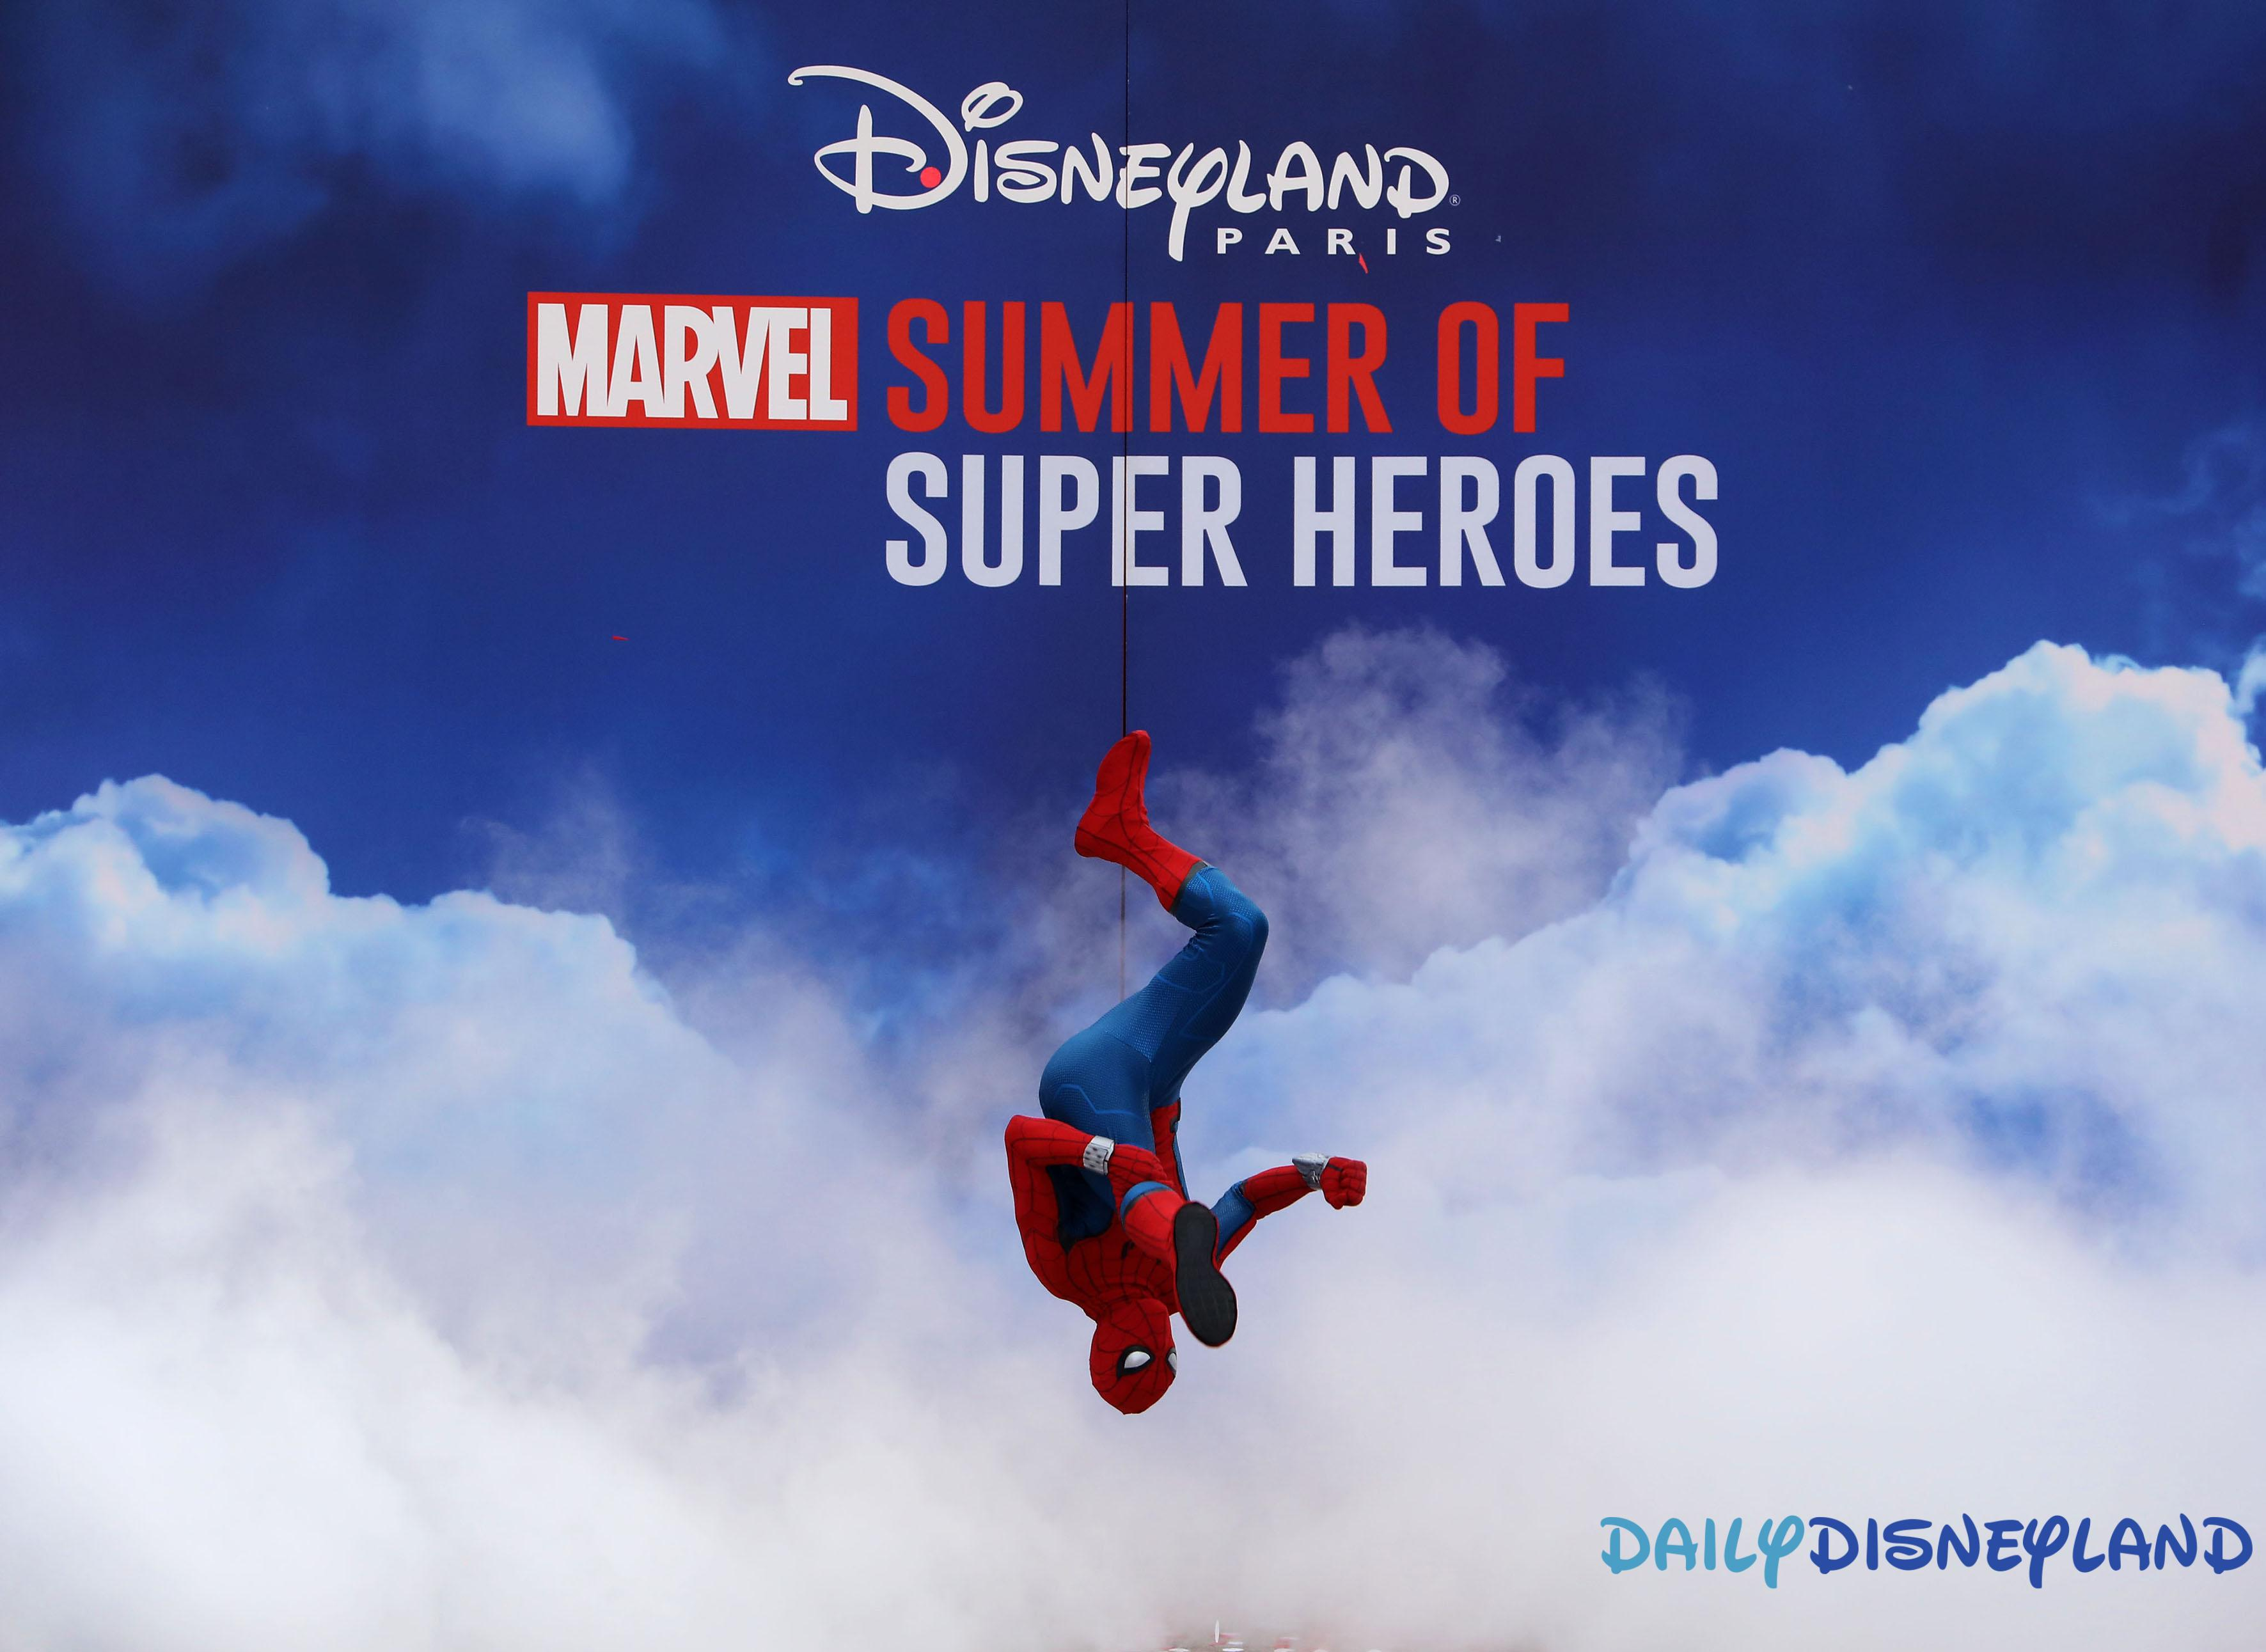 ete super héros marvel disneyland paris avis 2018